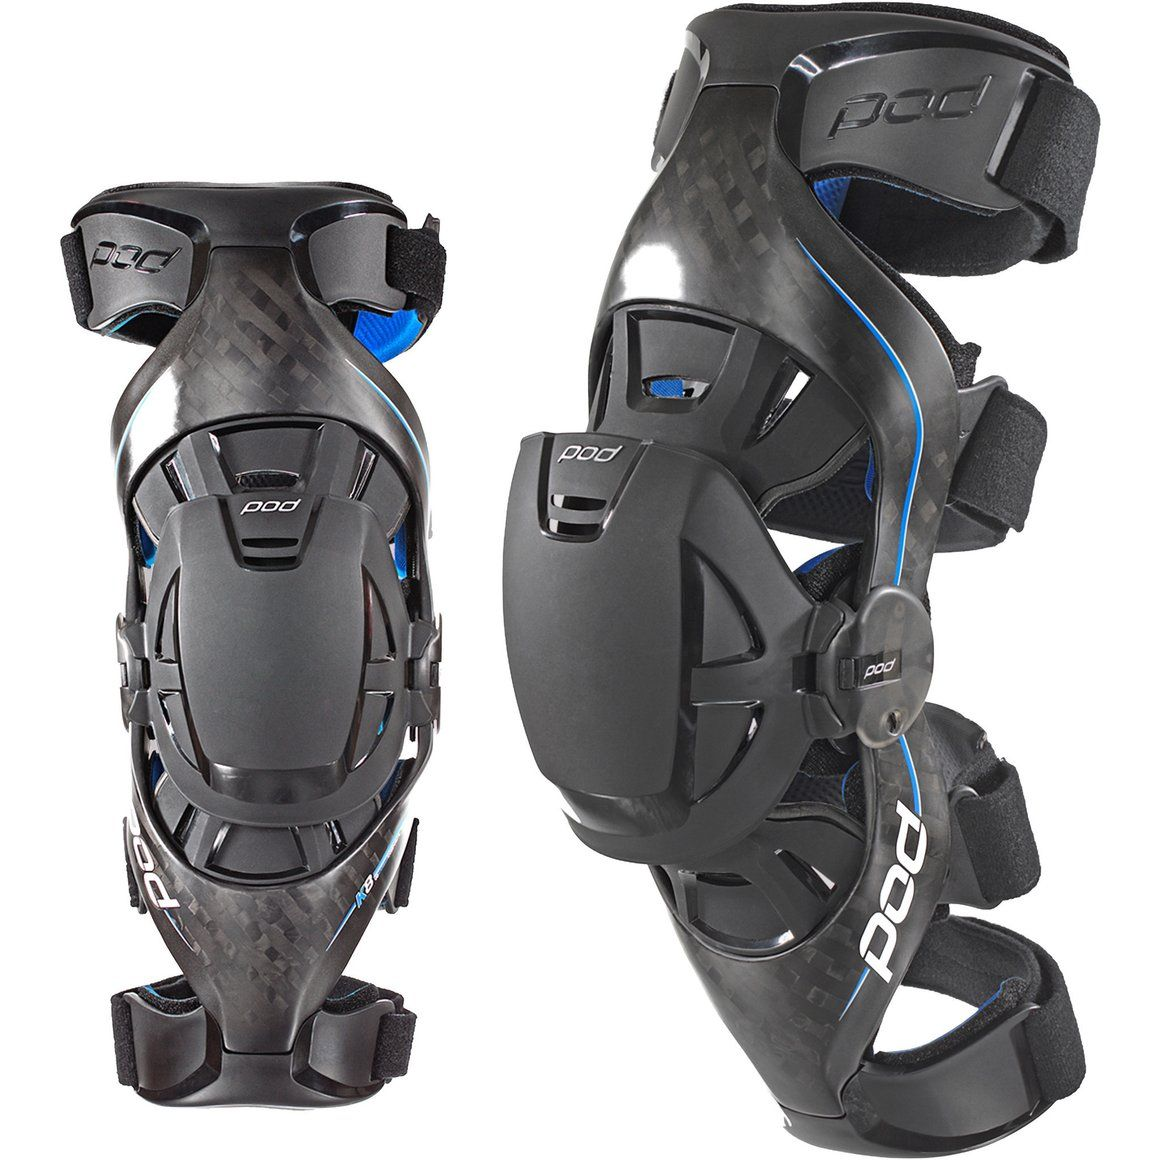 POD MX Ultimate Carbon Knee Brace buy now Athlete Braces